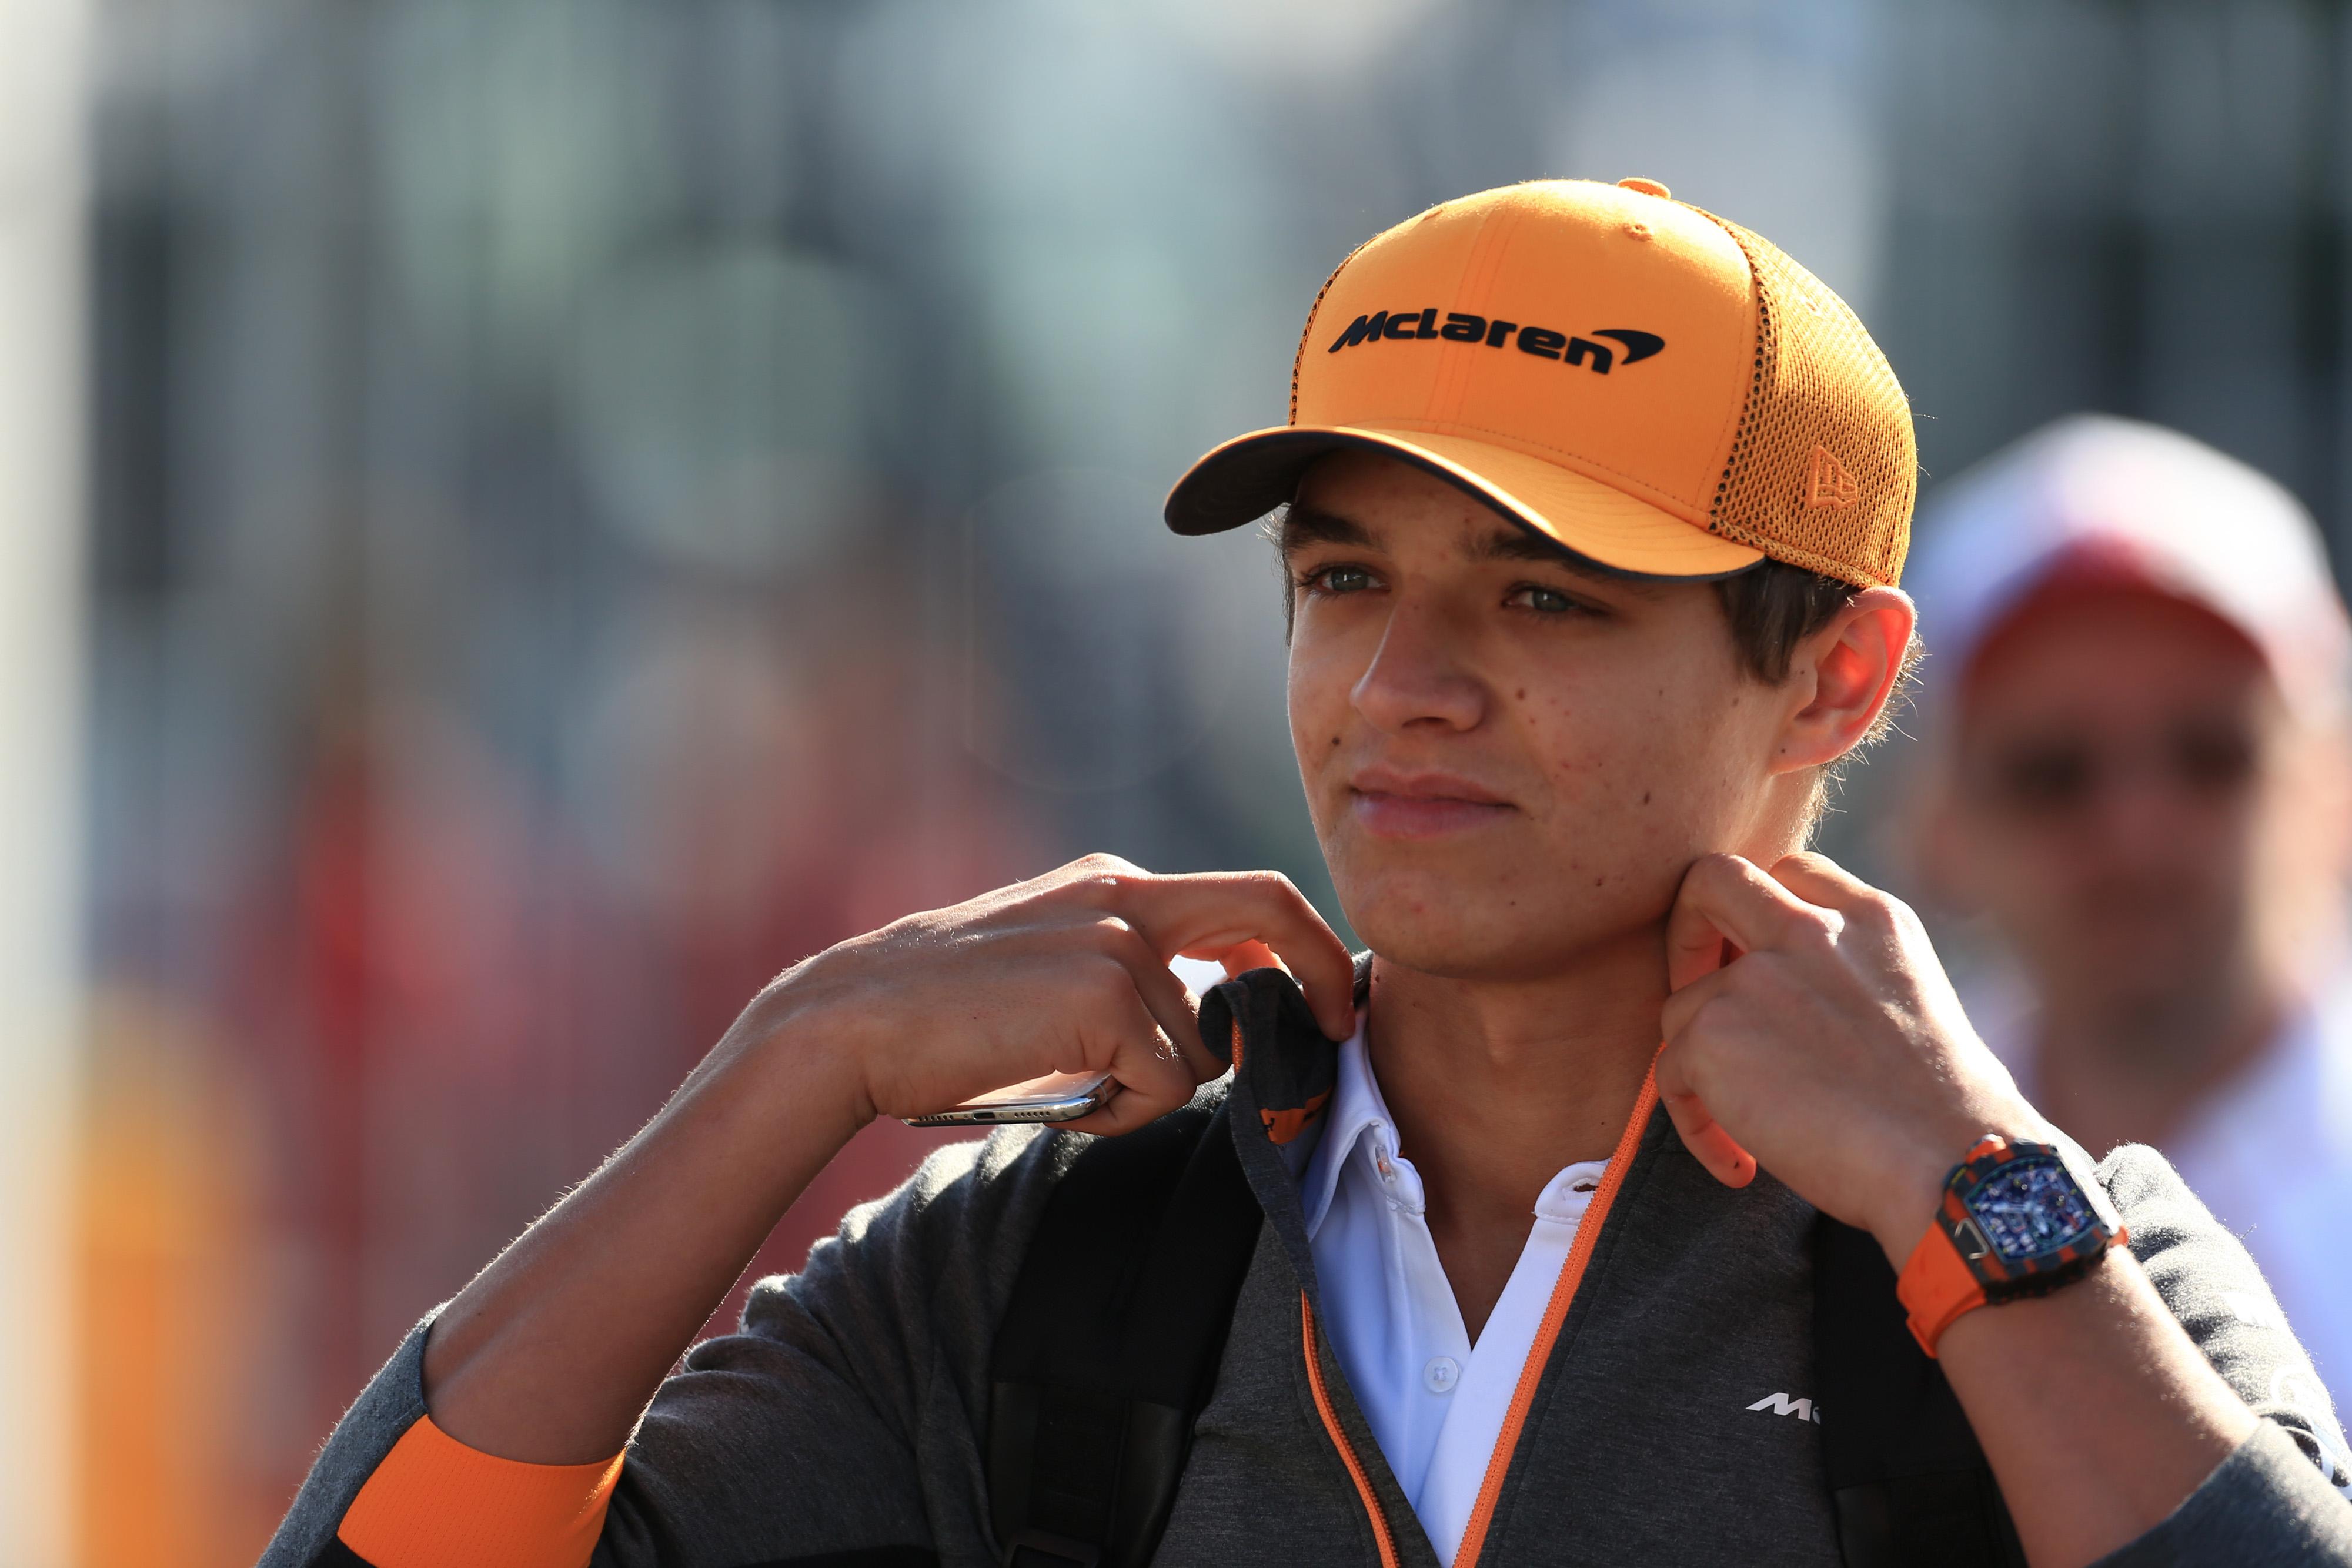 F1 Formula 1 Lando Norris McLaren